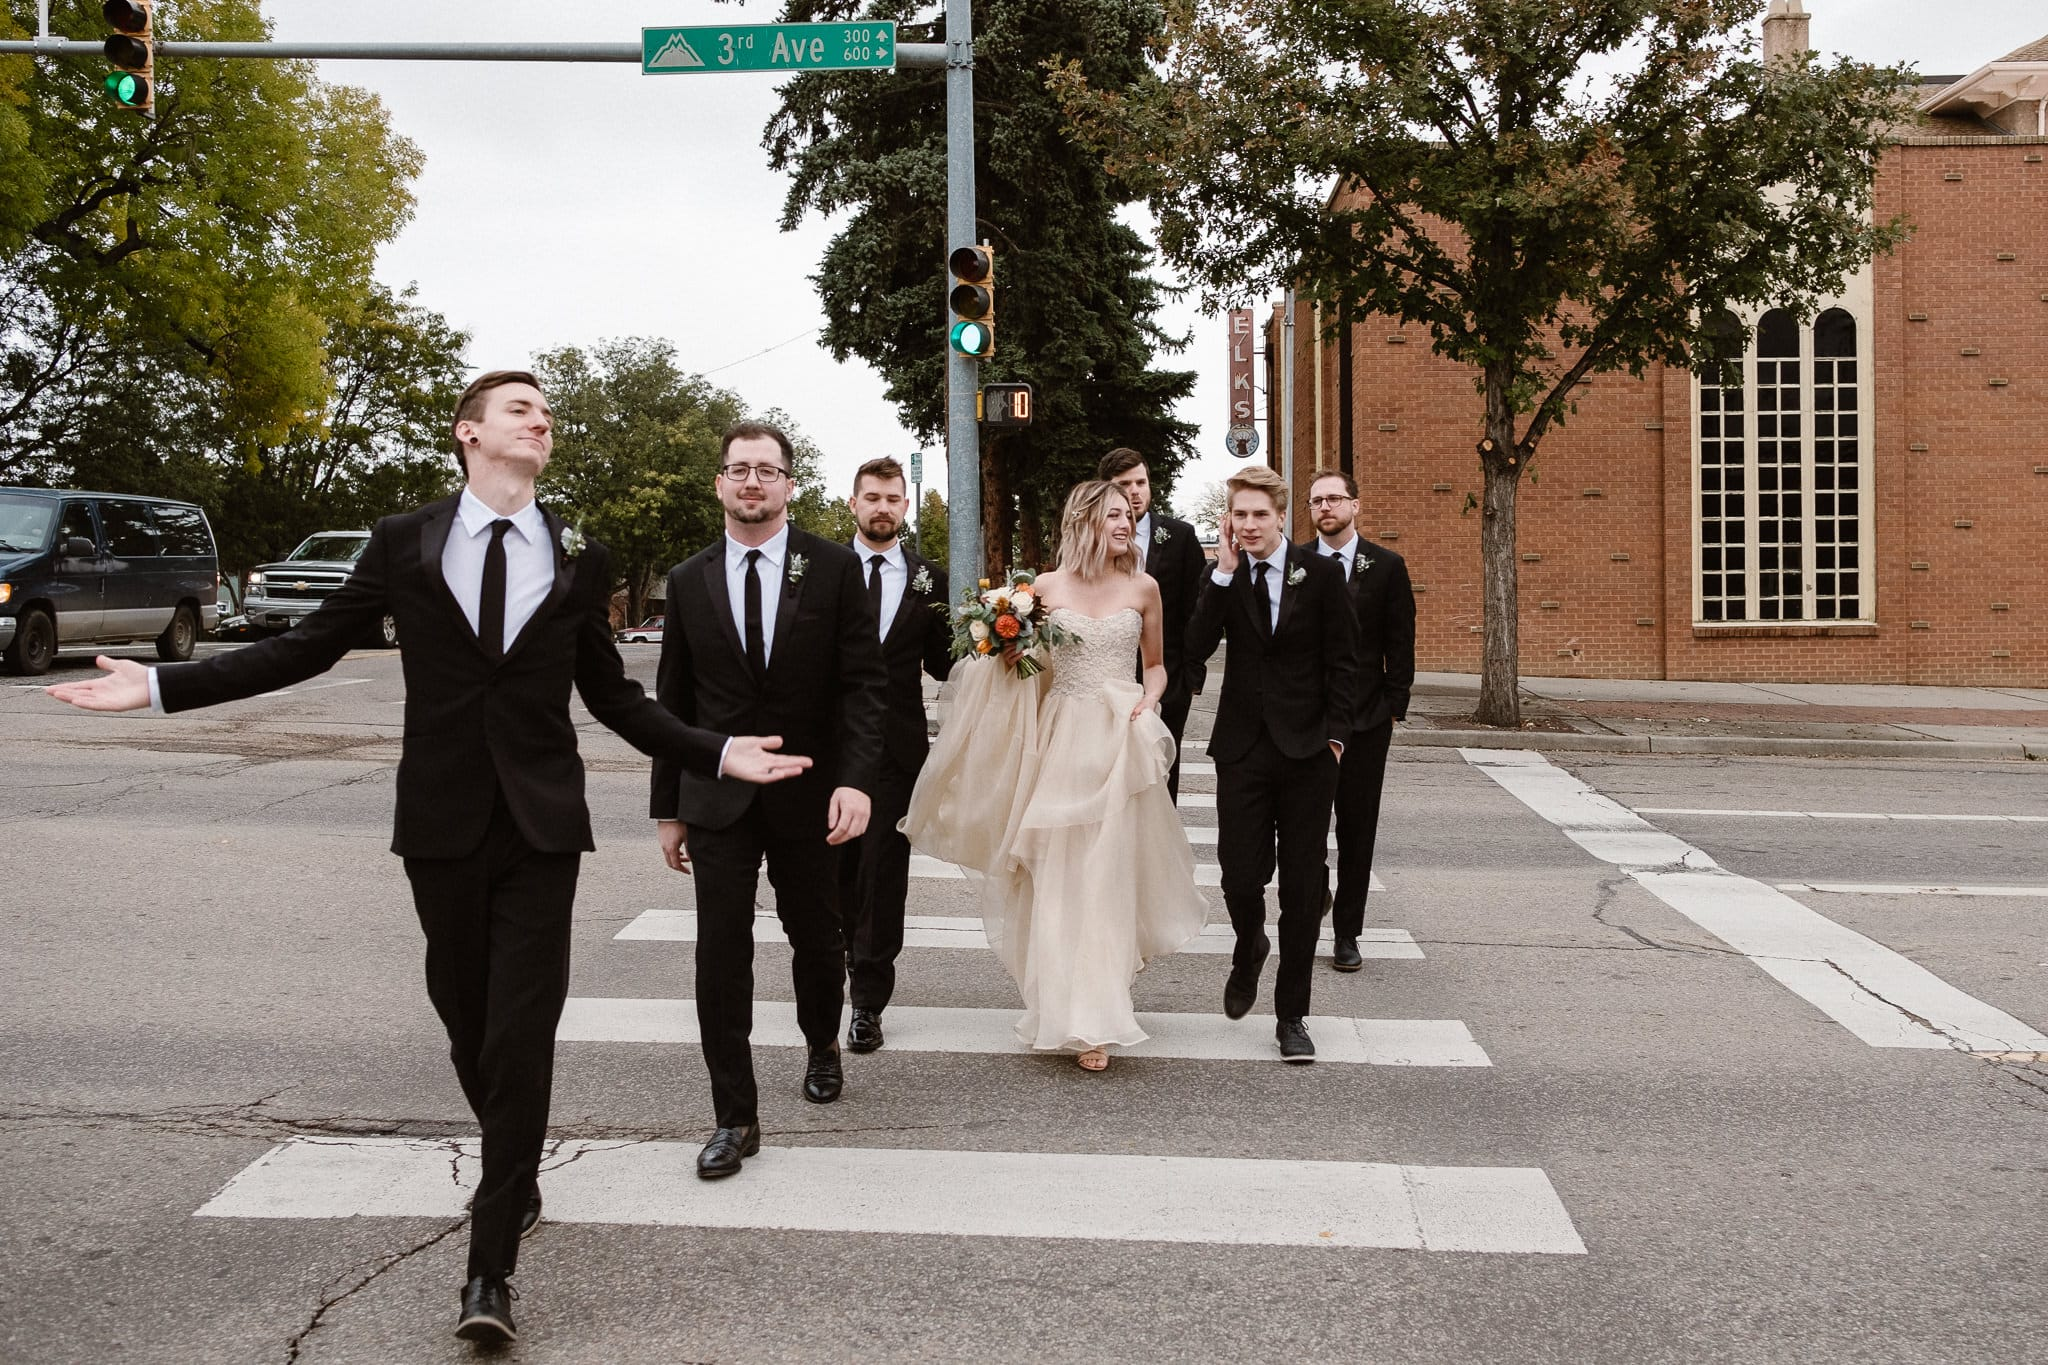 St Vrain Wedding Photographer | Longmont Wedding Photographer | Colorado Winter Wedding Photographer, Colorado industrial chic wedding, bride and groom with wedding party